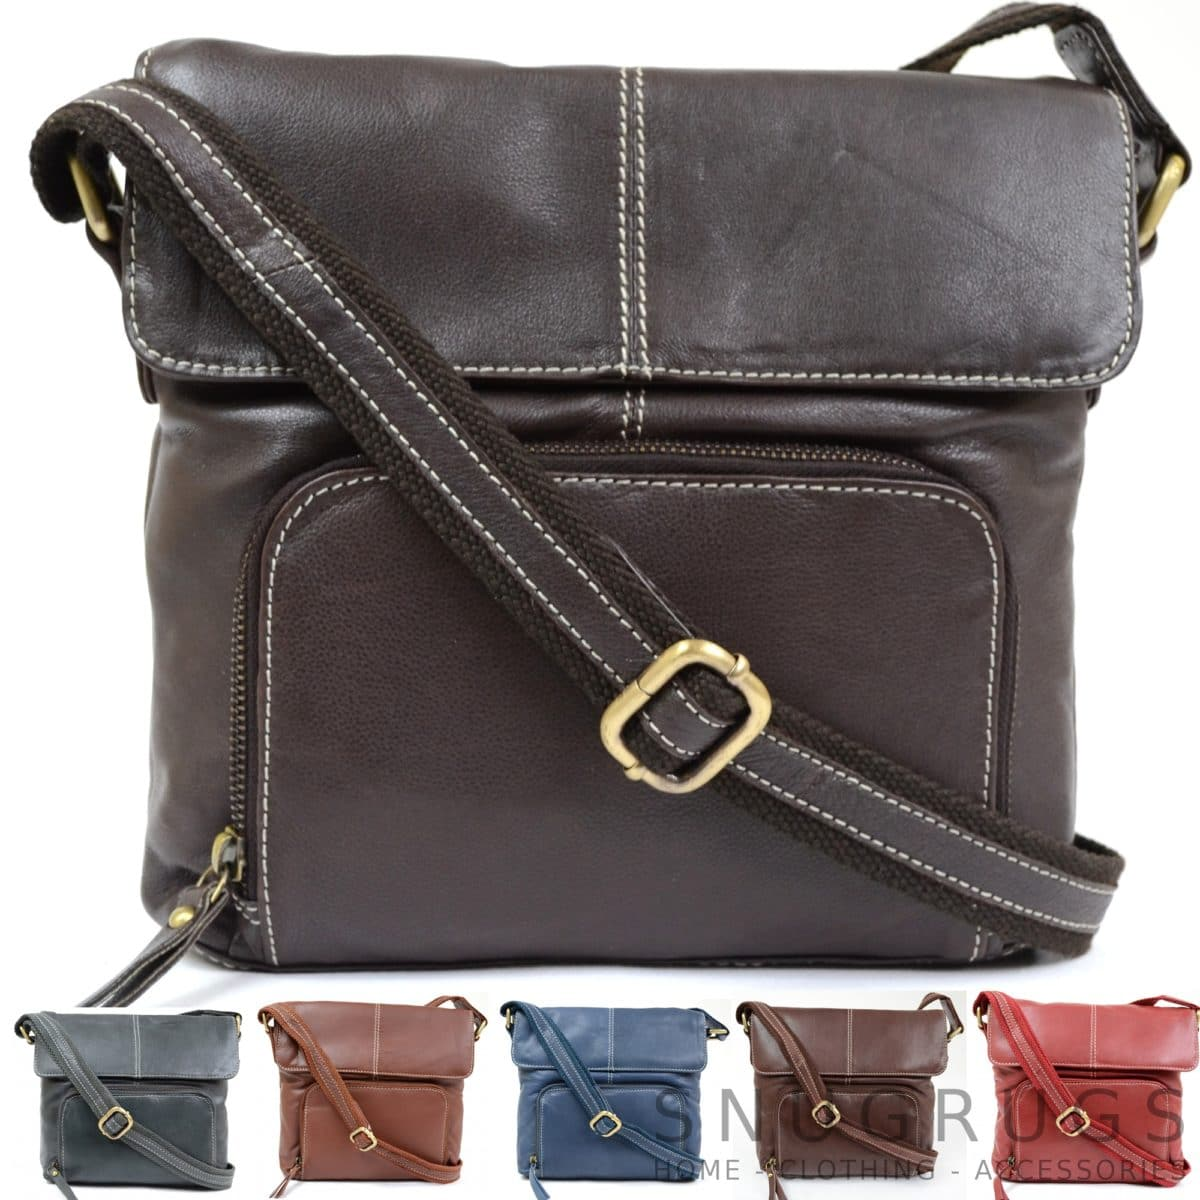 Georgie – Soft Leather Shoulder / Cross Body Bag